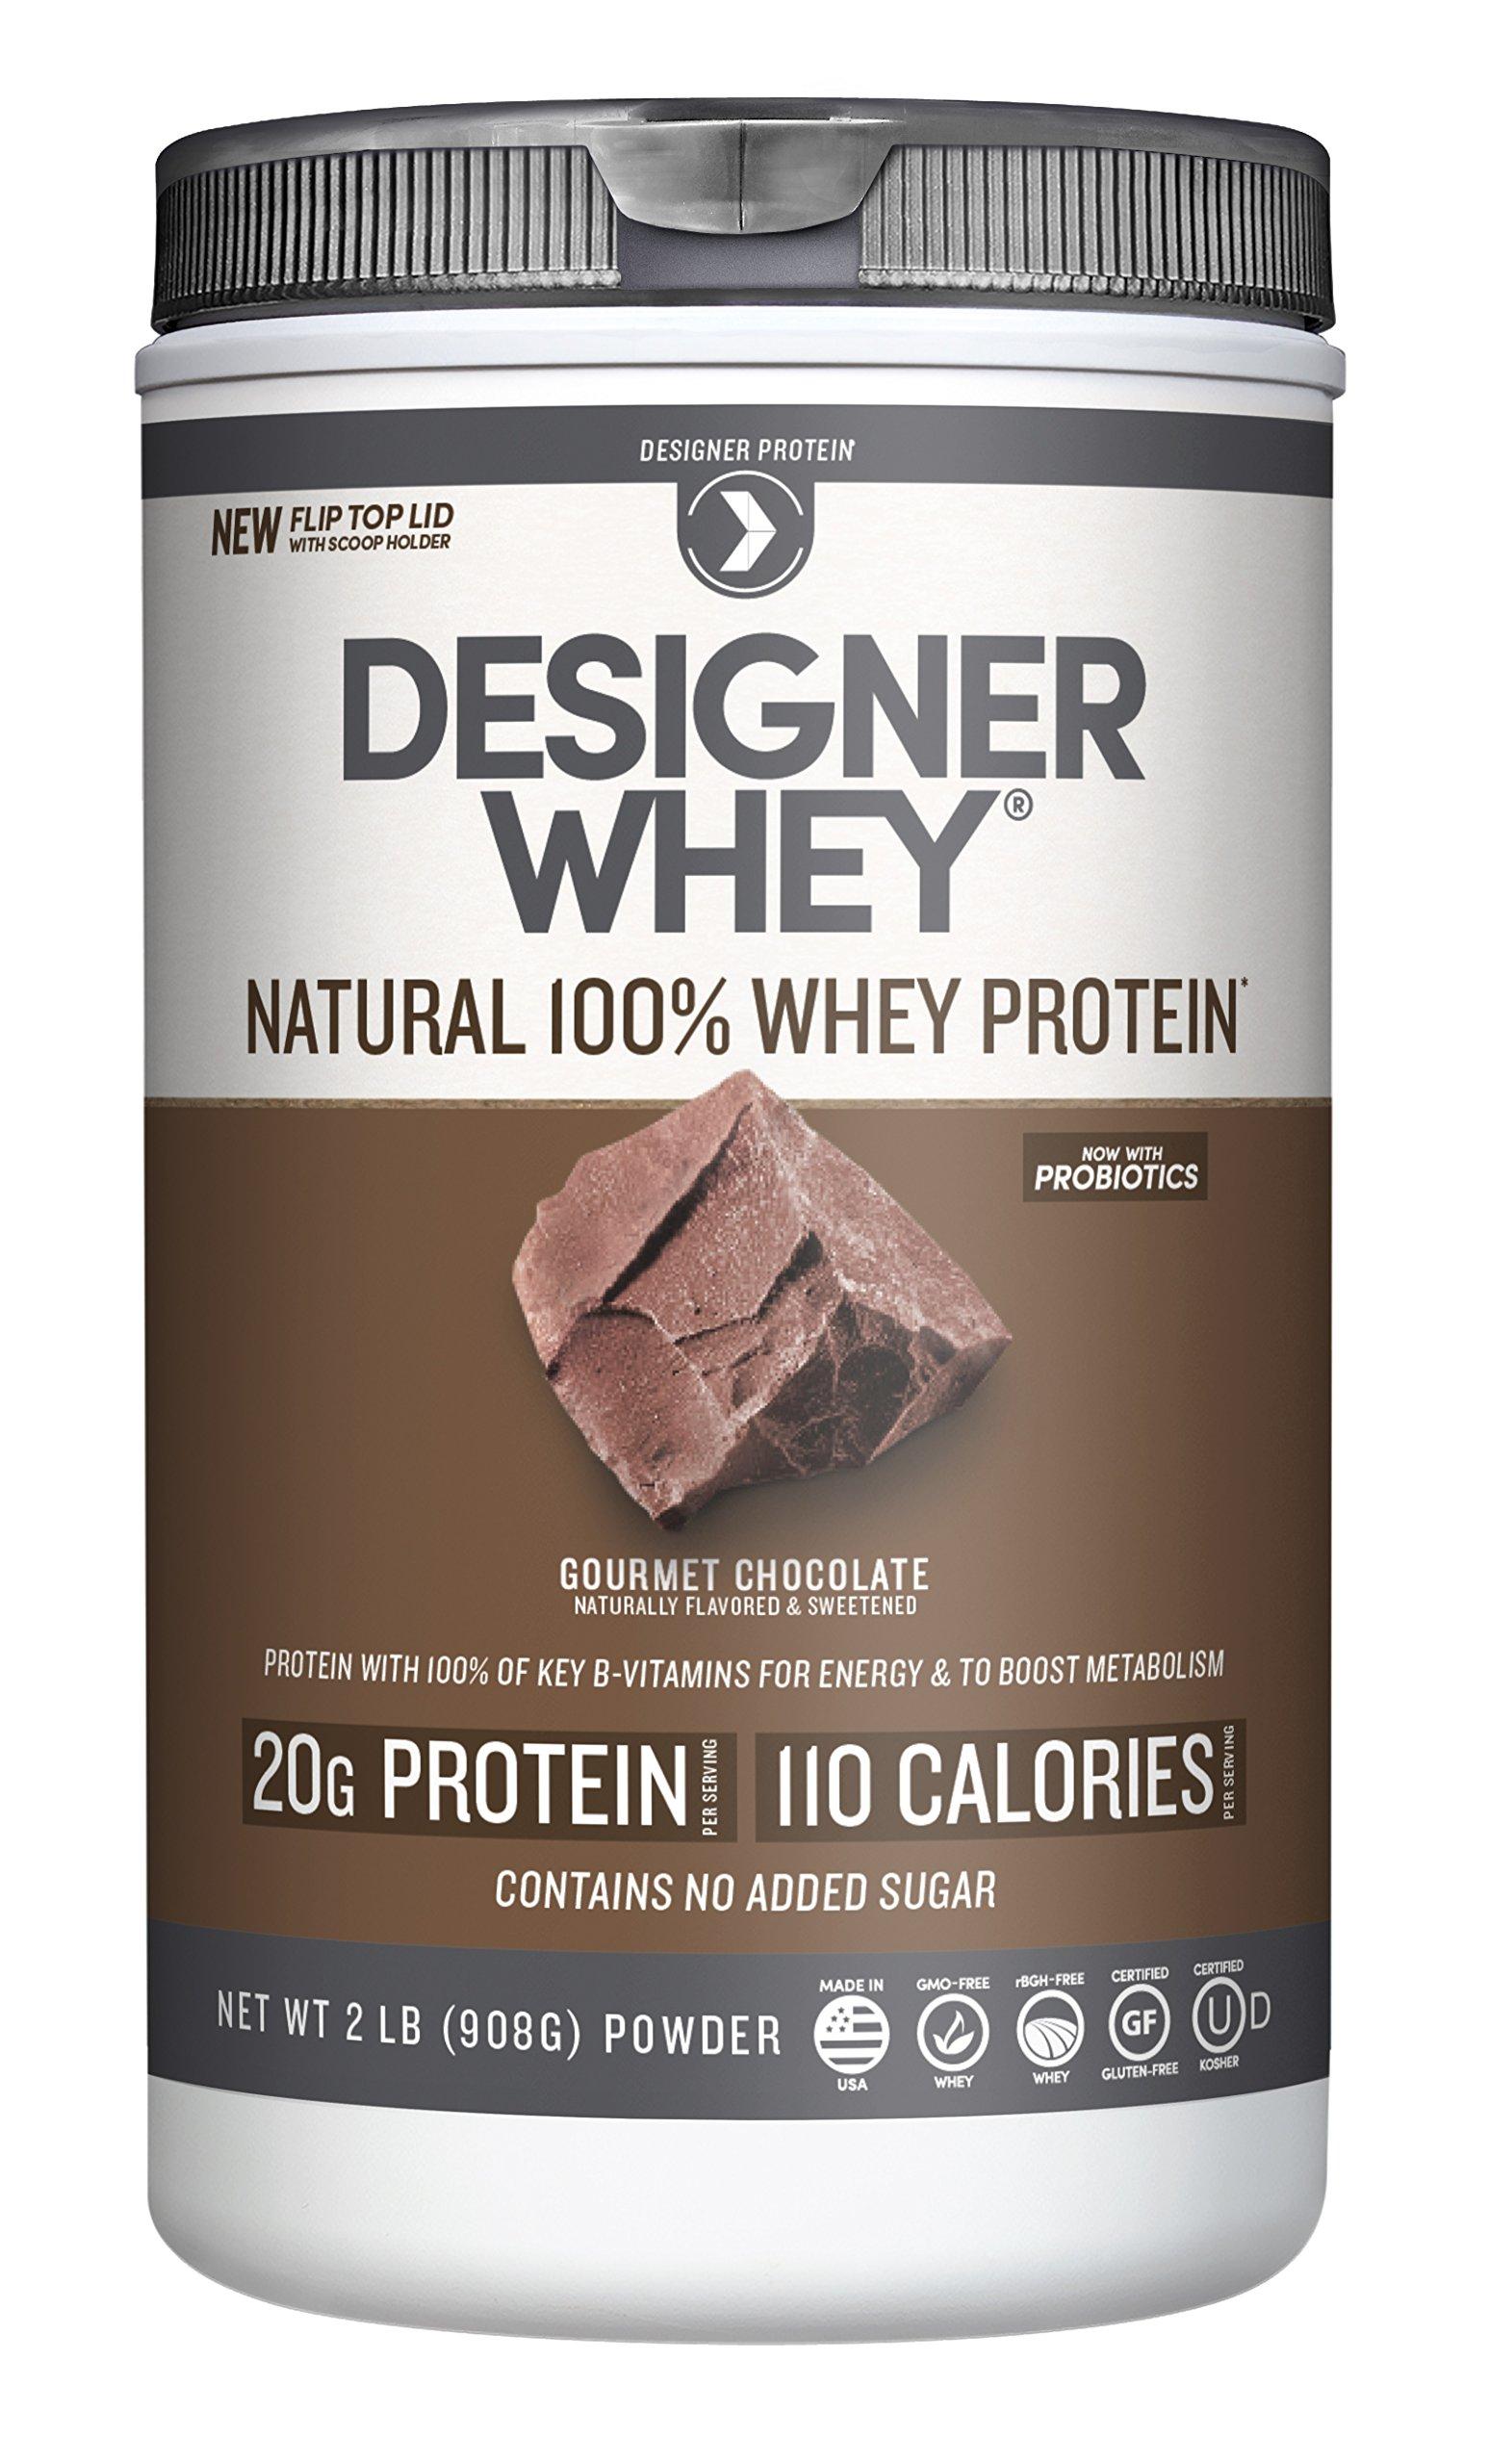 Designer Whey Premium Natural 100% Whey Protein, Gourmet Chocolate, 2 Pound